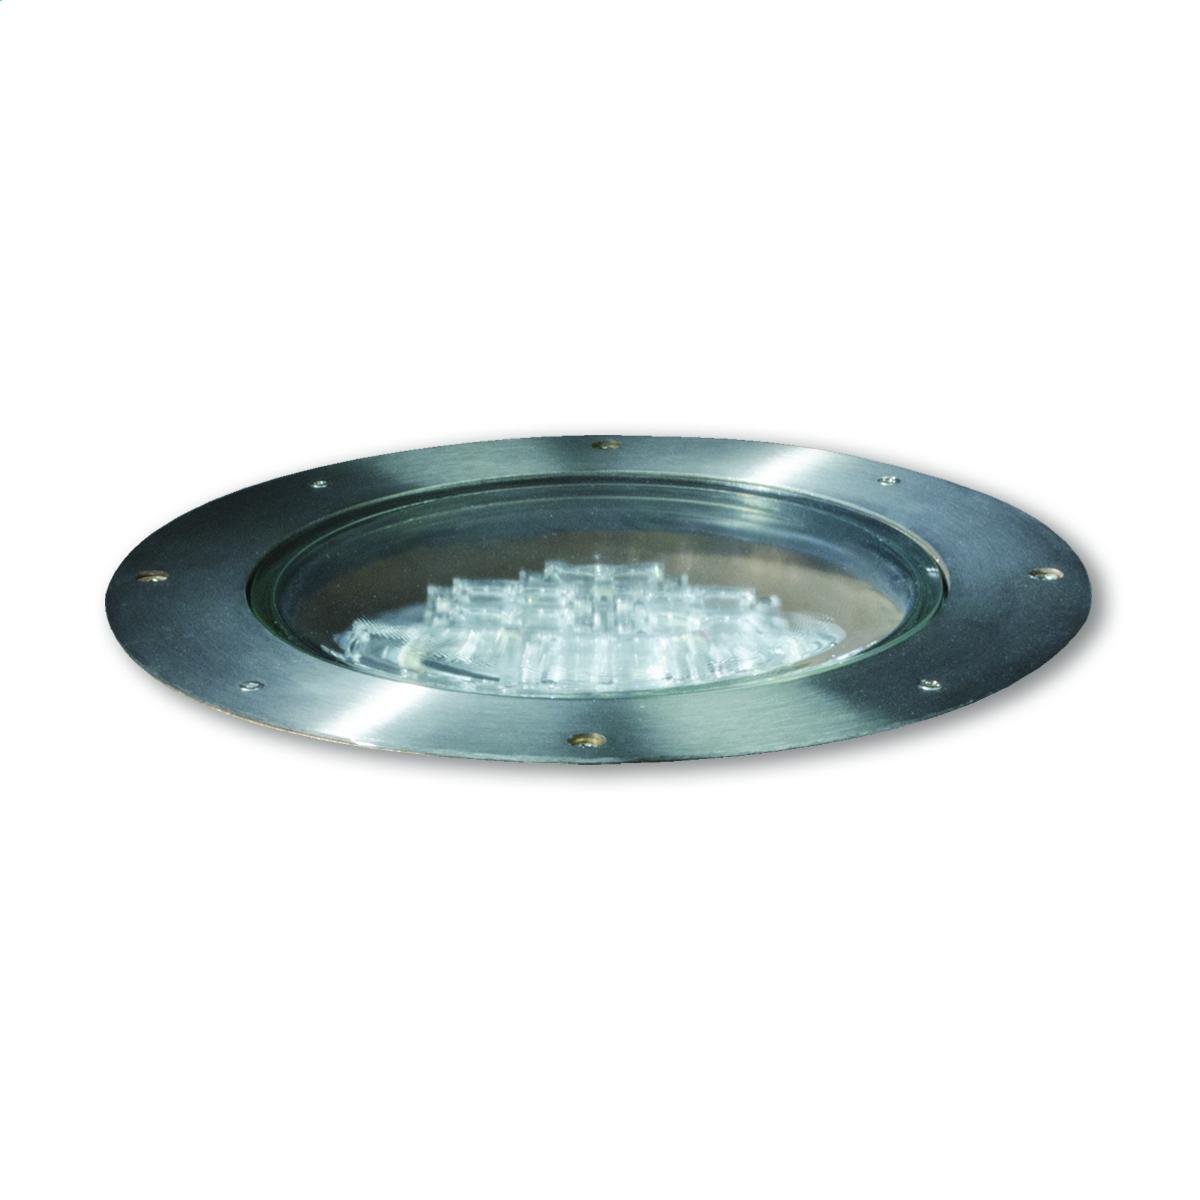 Lightvault® 8 RGBW Stainless Steel